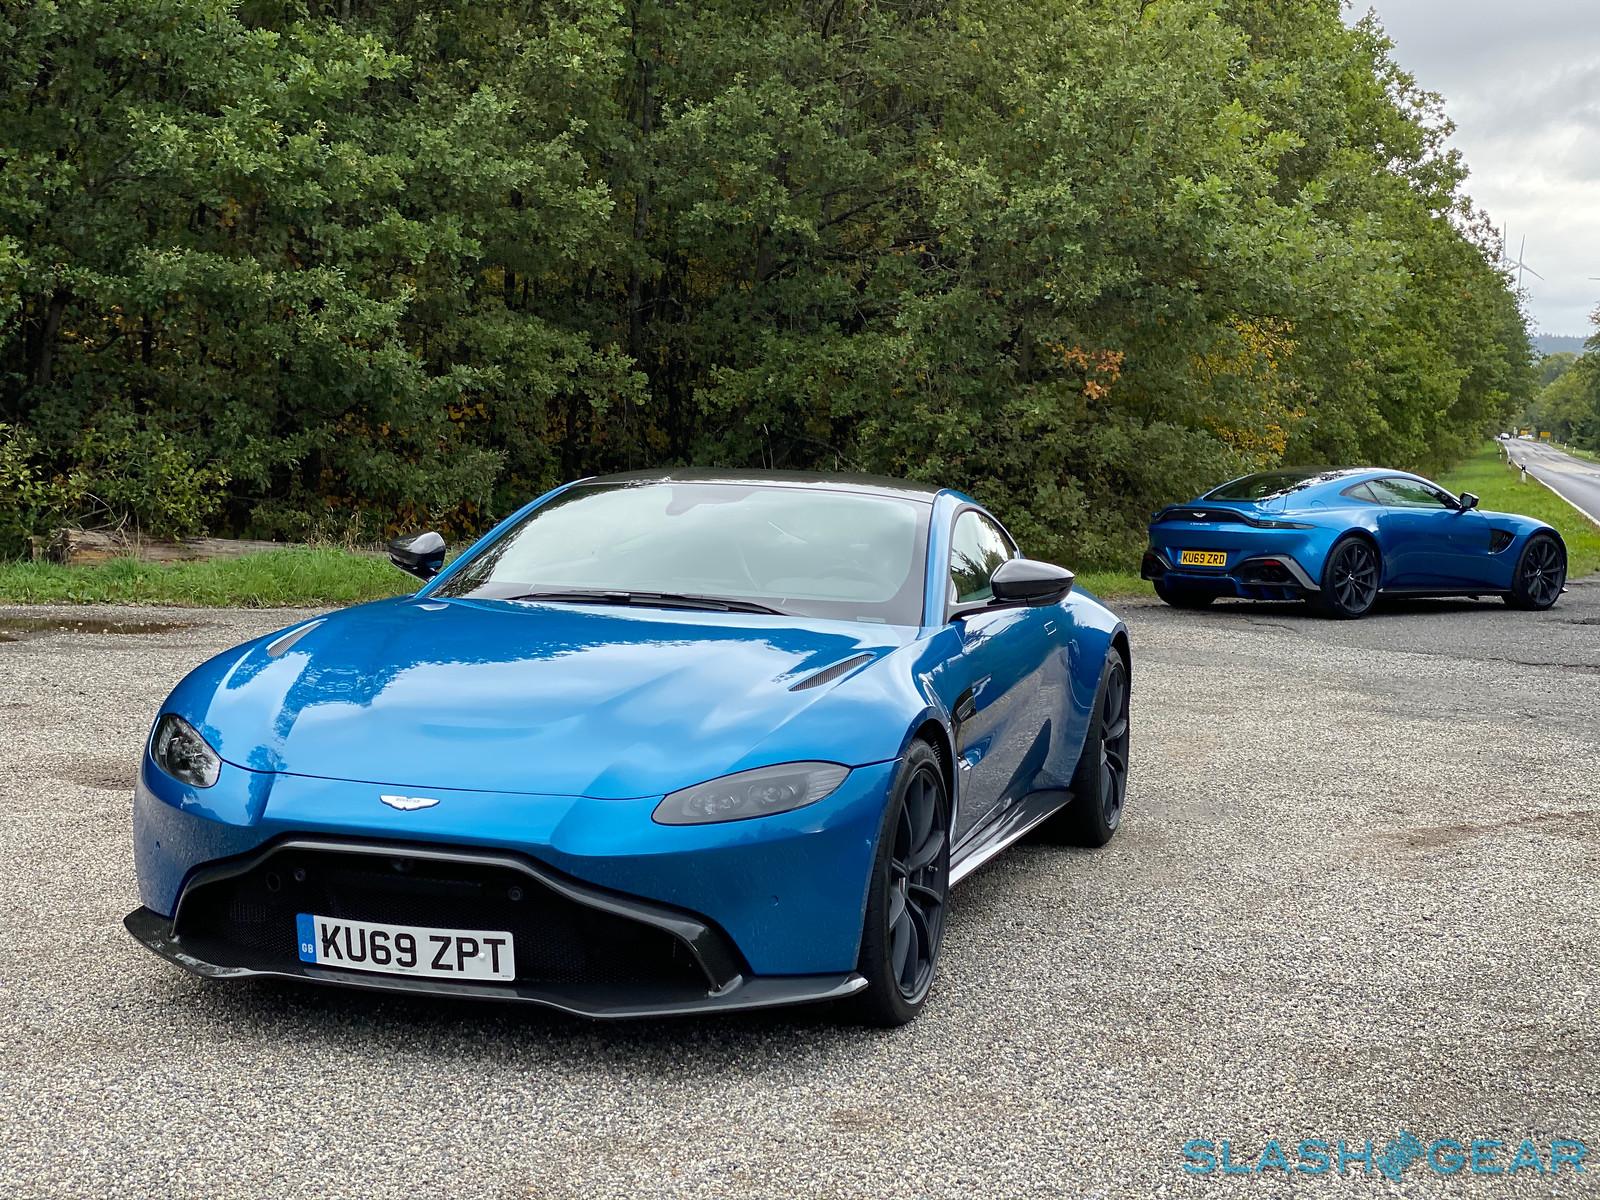 2020 Aston Martin Vantage Amr First Drive Long Live The Manual Slashgear